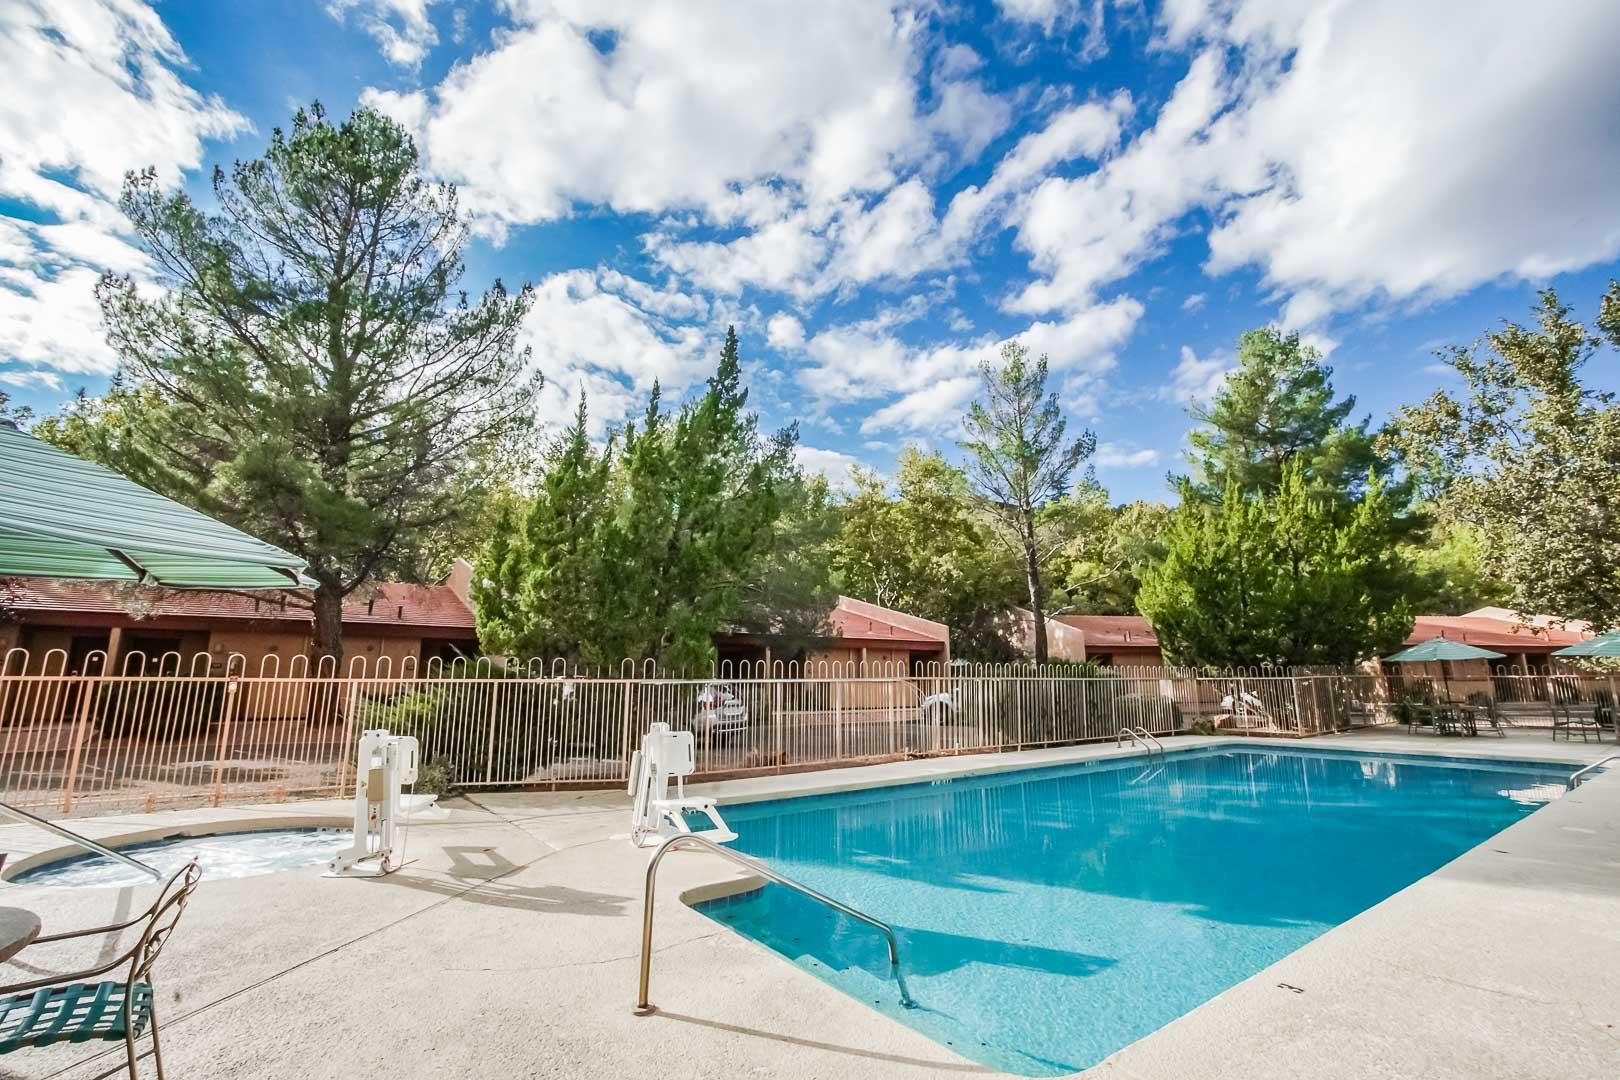 A crisp outdoor swimming pool at VRI's Villas at Poco Diablo in Sedona, Arizona.